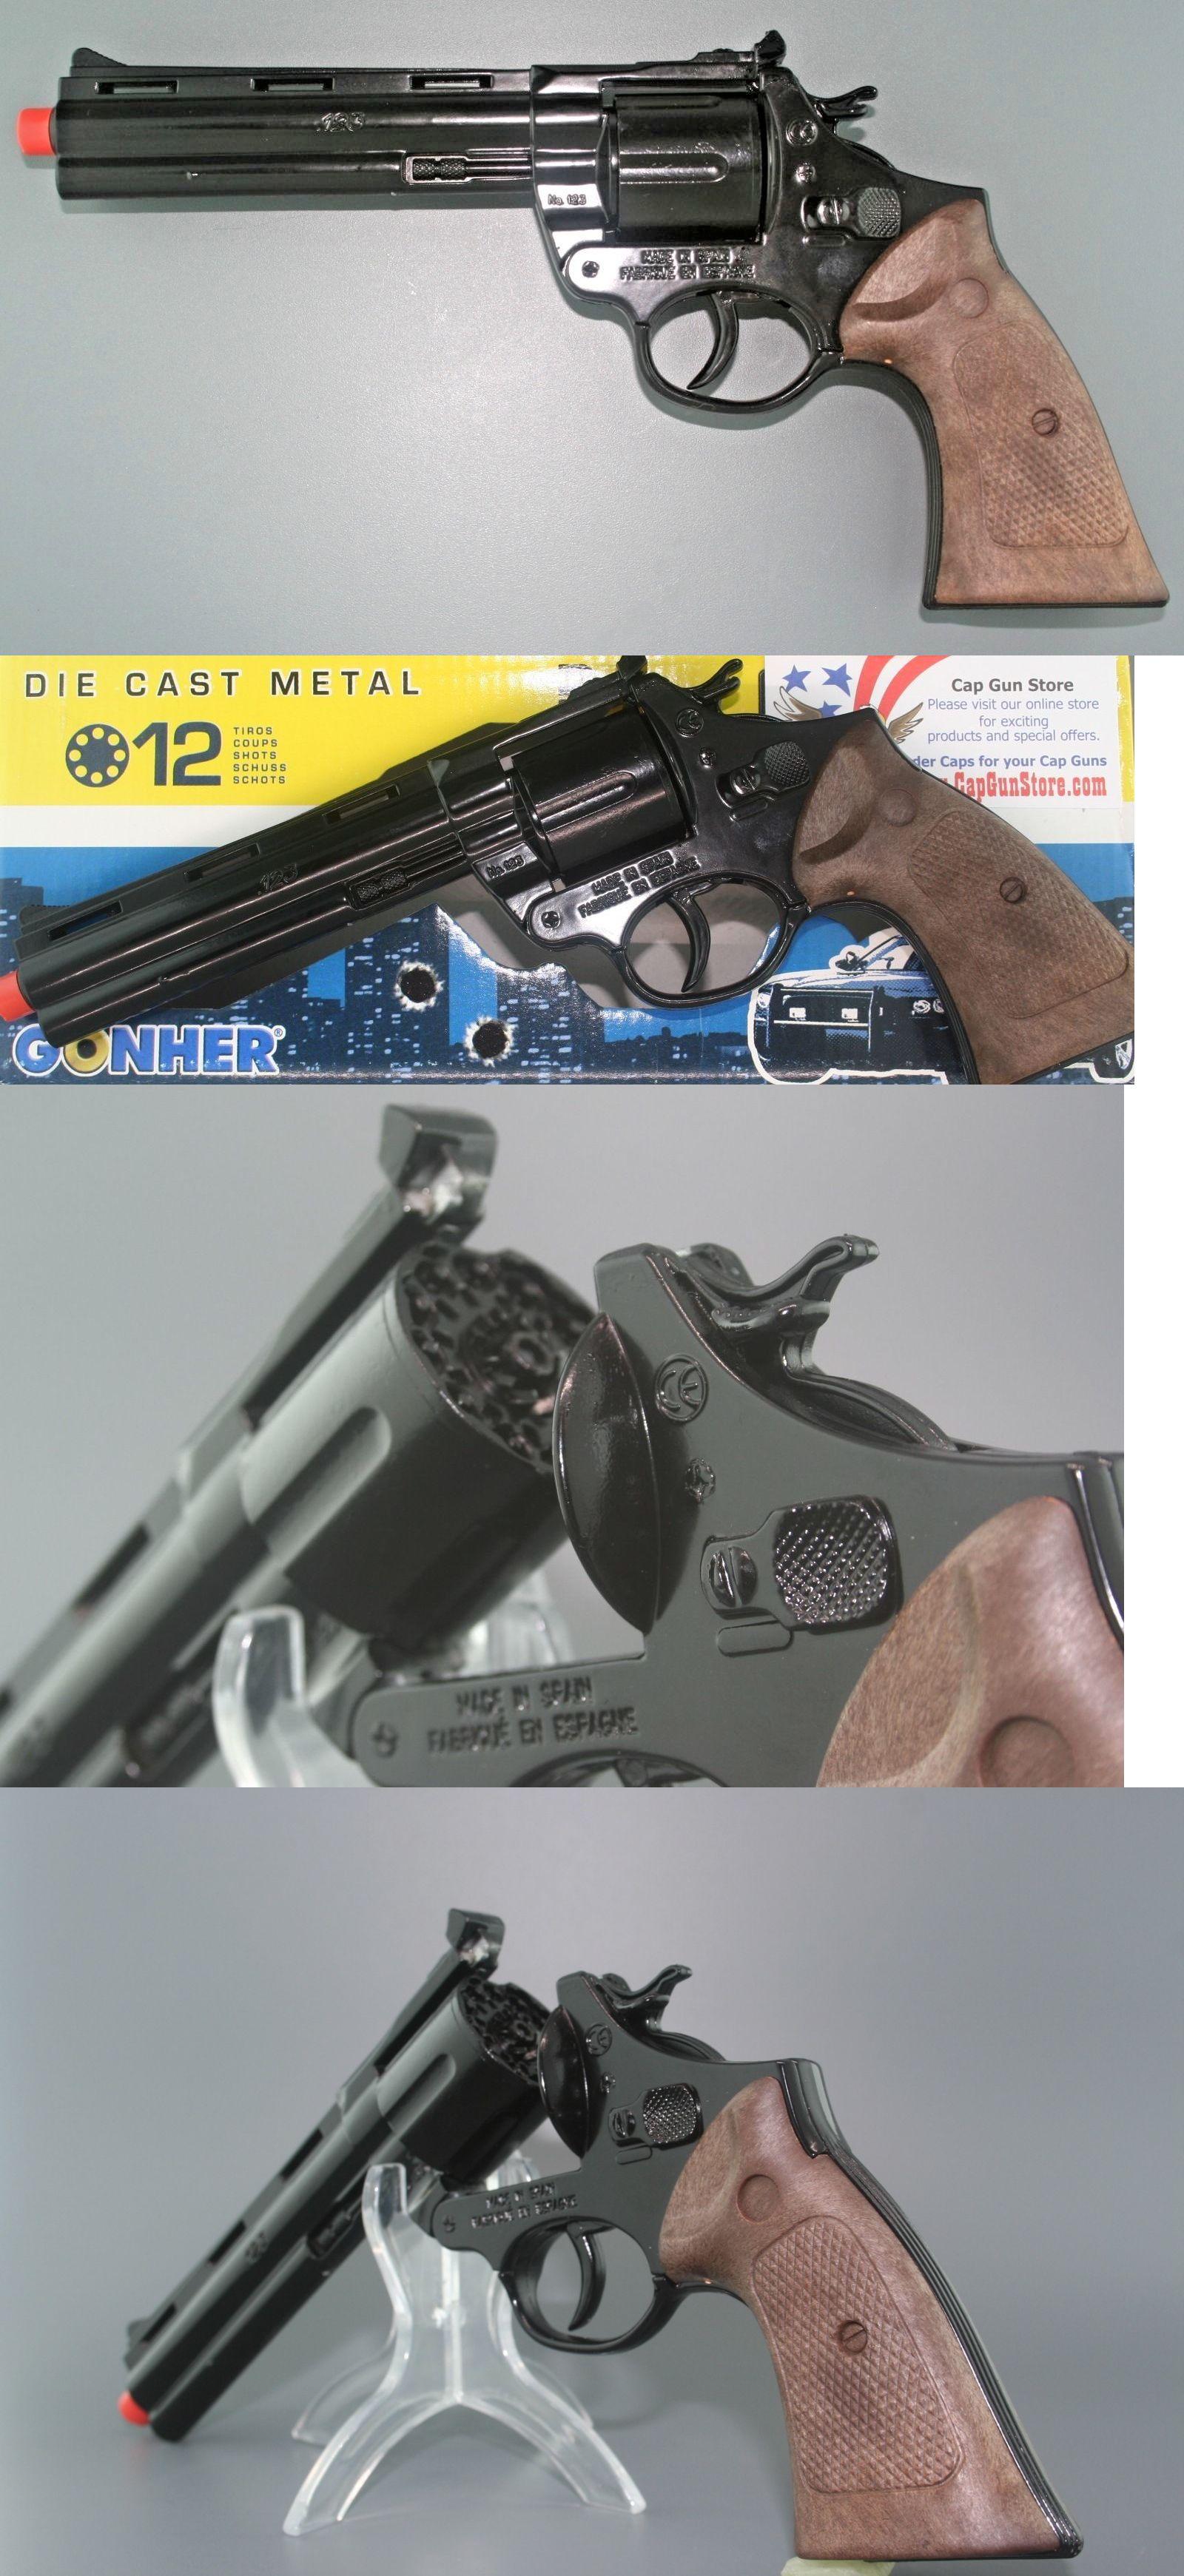 8 Ring Shot Cap Gun Police Series Pistol Revolver Black New play Toy Replica